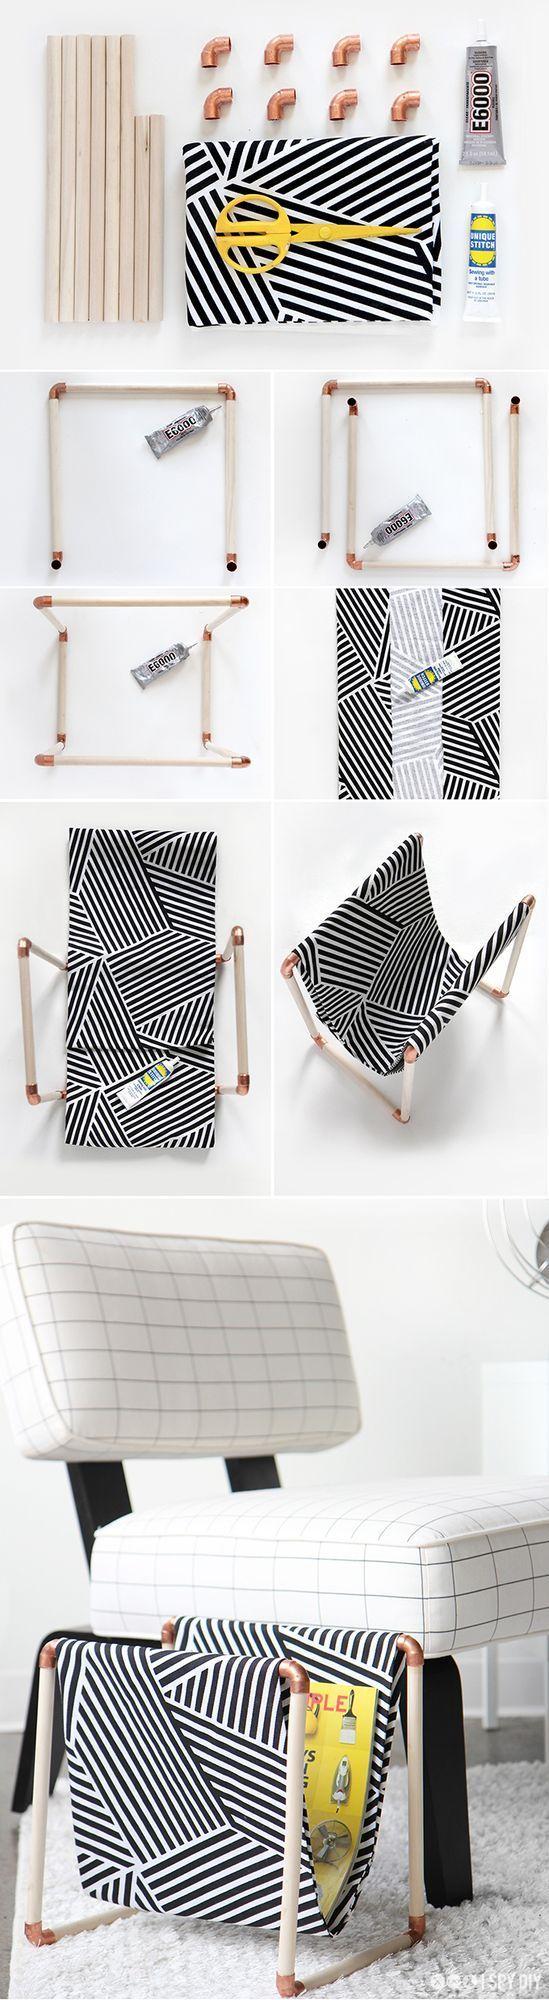 Cotton Fabric, Copper & Wood Magazine Holder   I Spy DIY